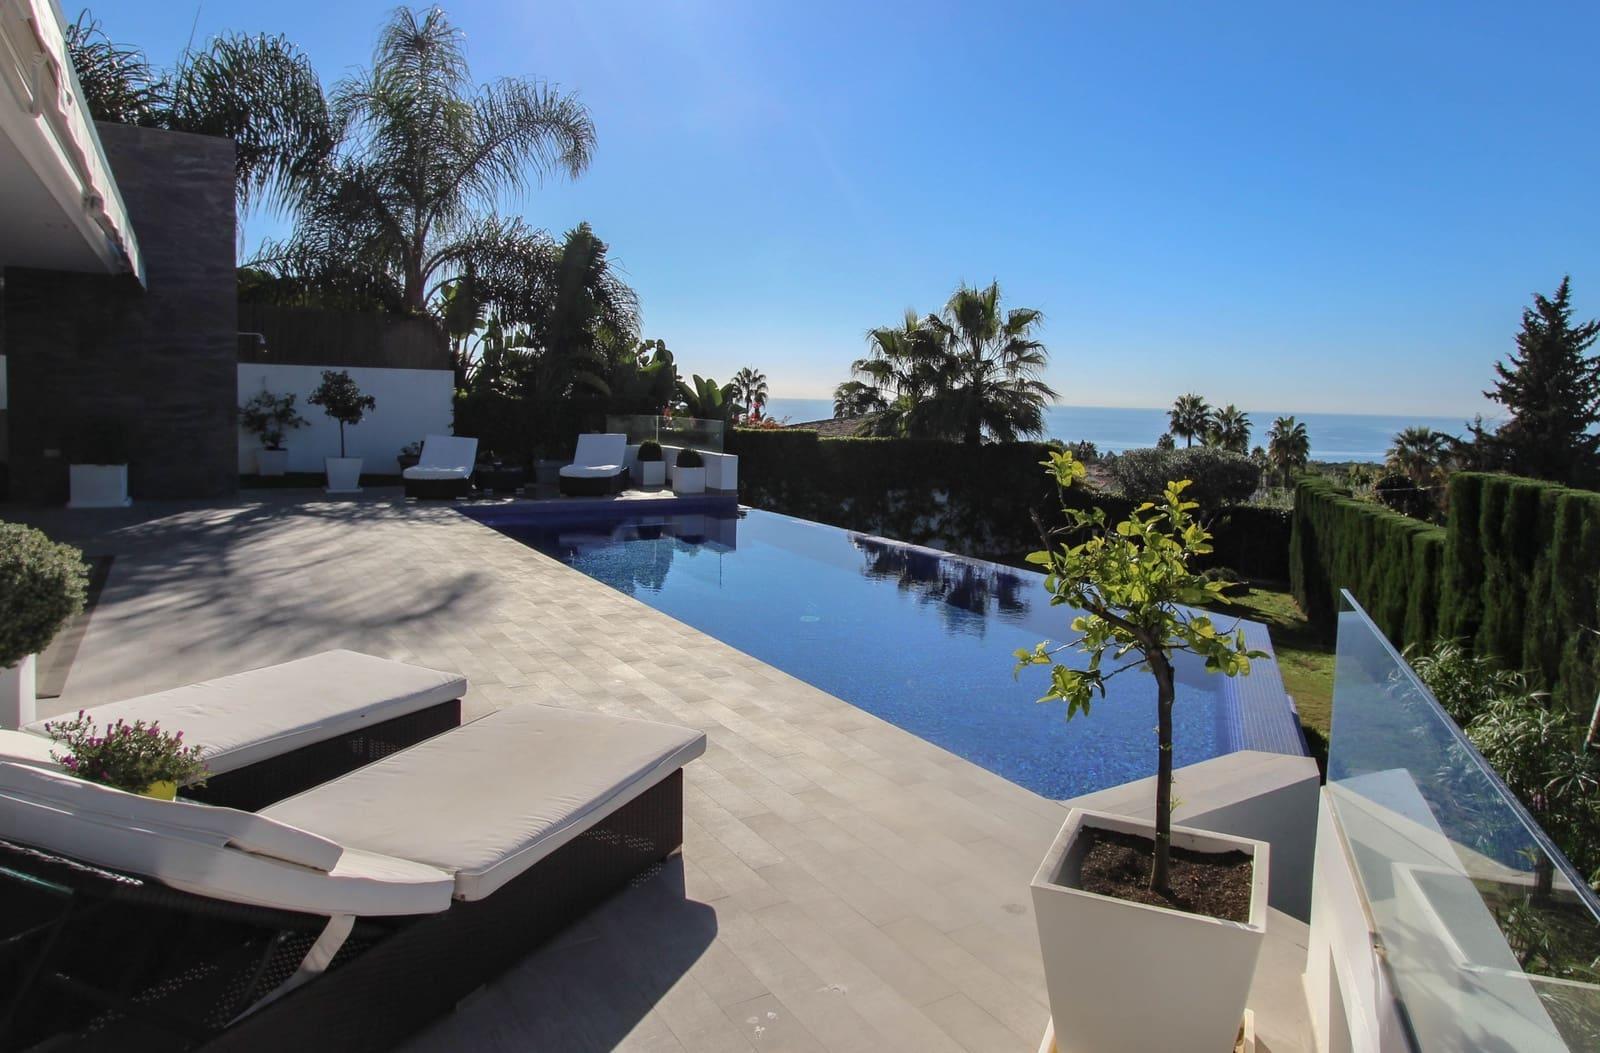 5 bedroom Villa for sale in Marbella with pool - € 2,950,000 (Ref: 4823809)